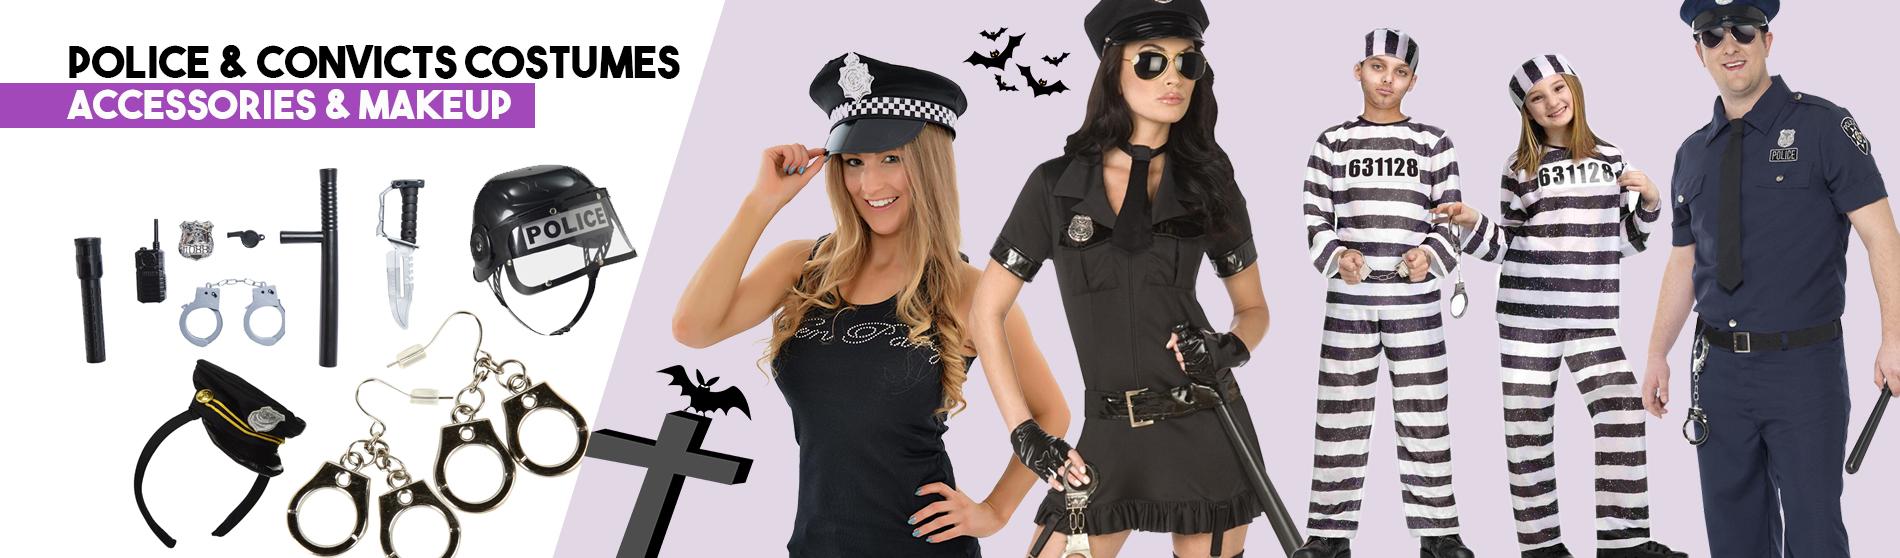 Police-Convicts-Costume-Accessories